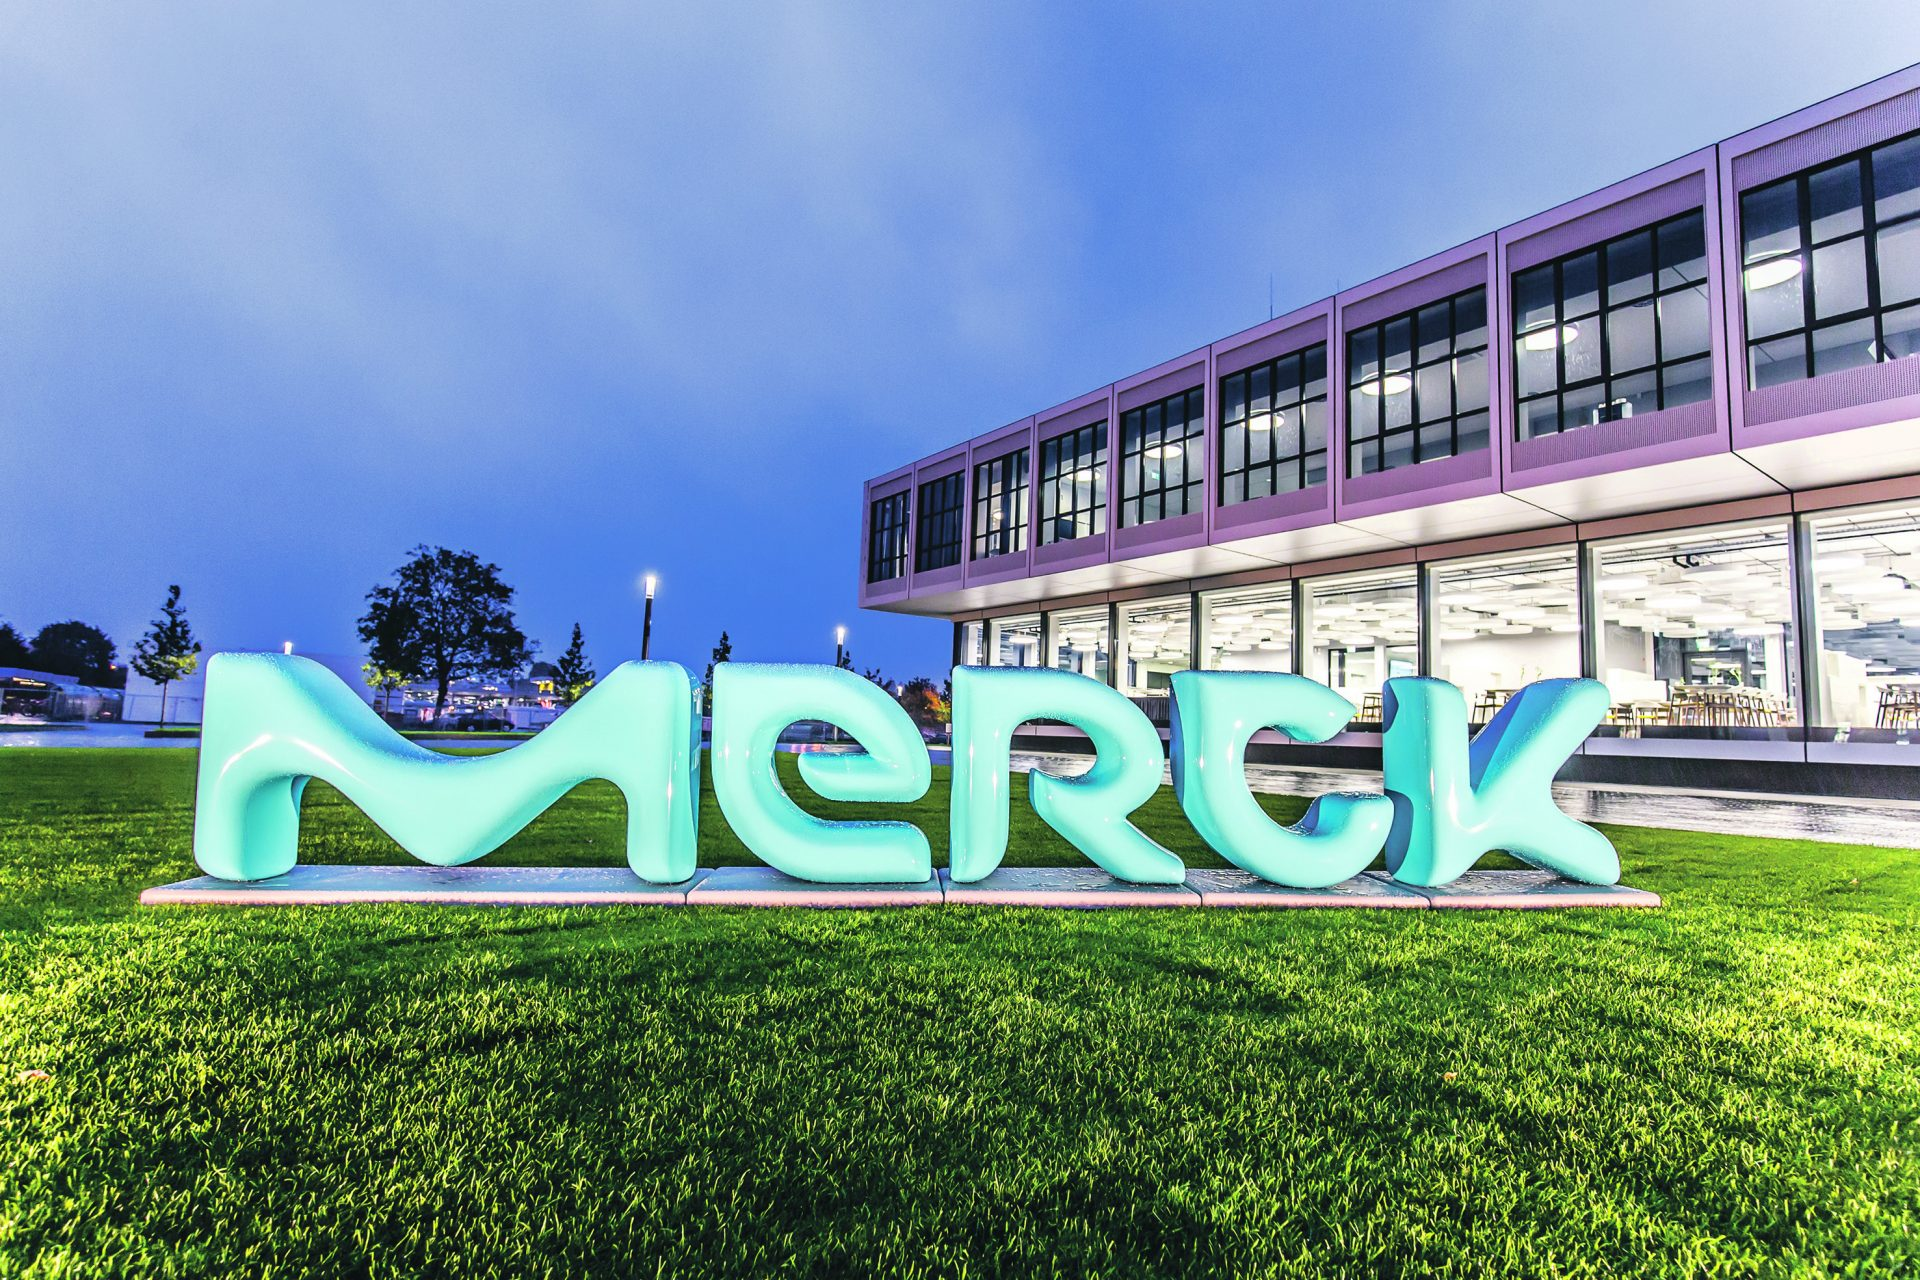 merck-concede-patentes-nos-eua-para-a-tecnologia-base-crispr-cas9